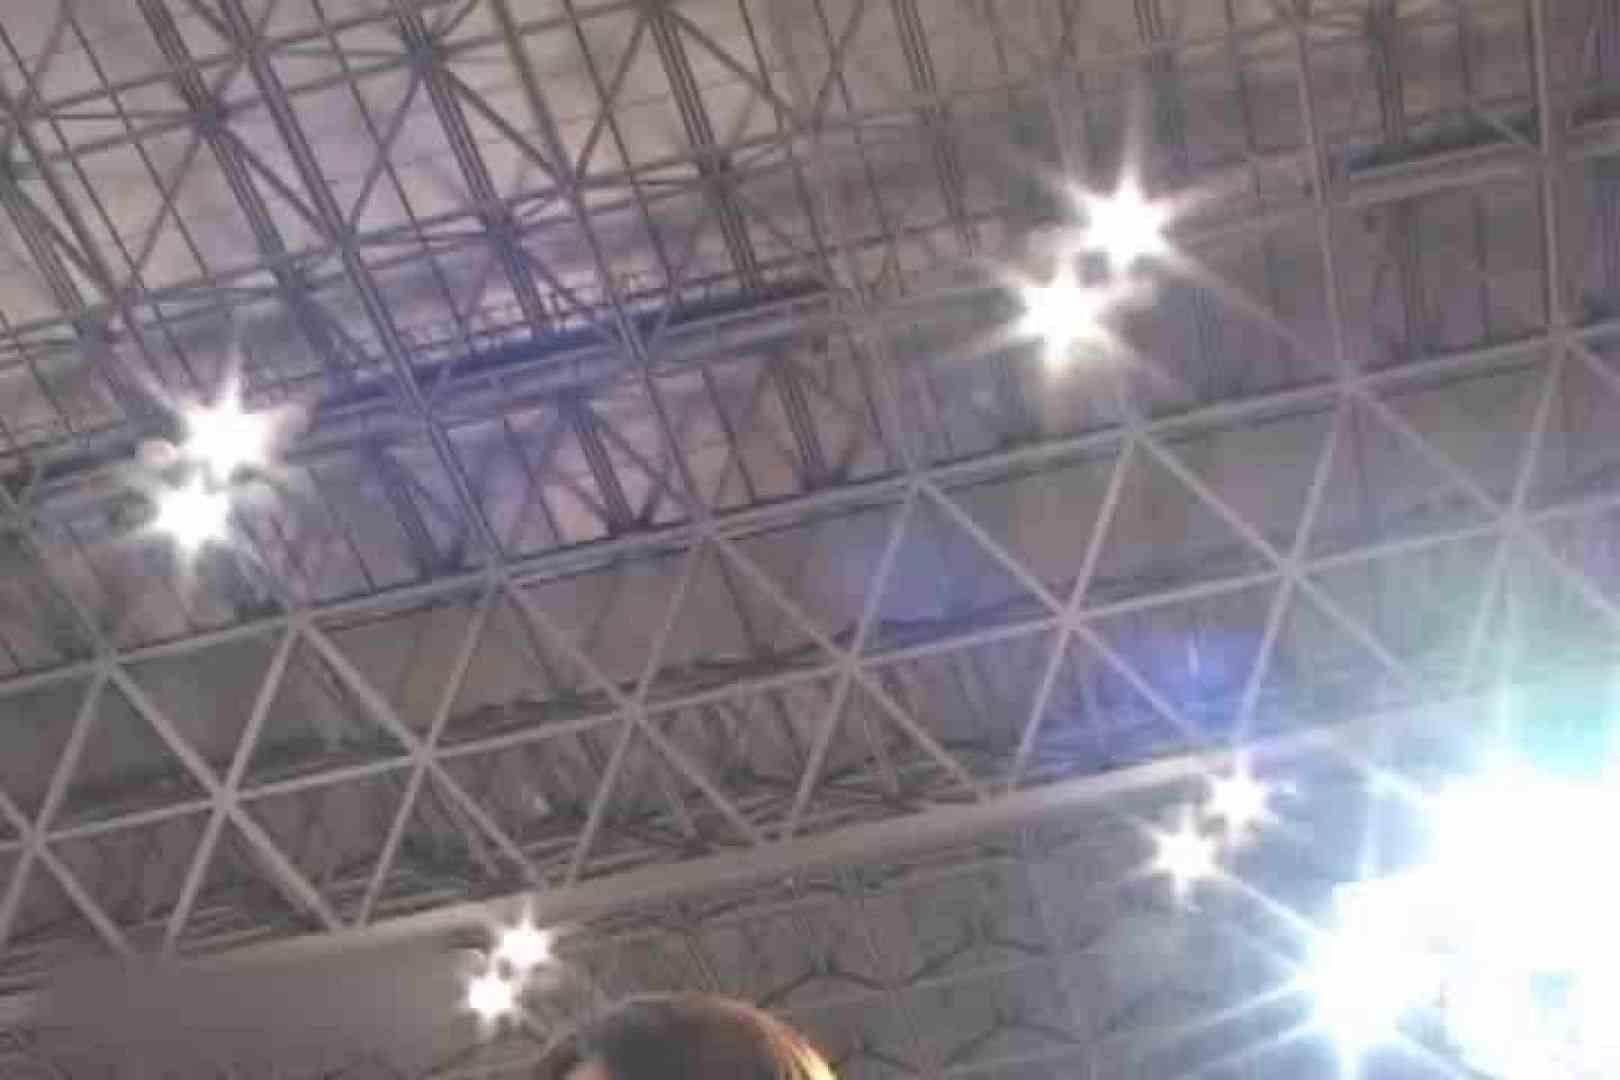 RQカメラ地獄Vol.33 エロティックなOL スケベ動画紹介 70画像 17